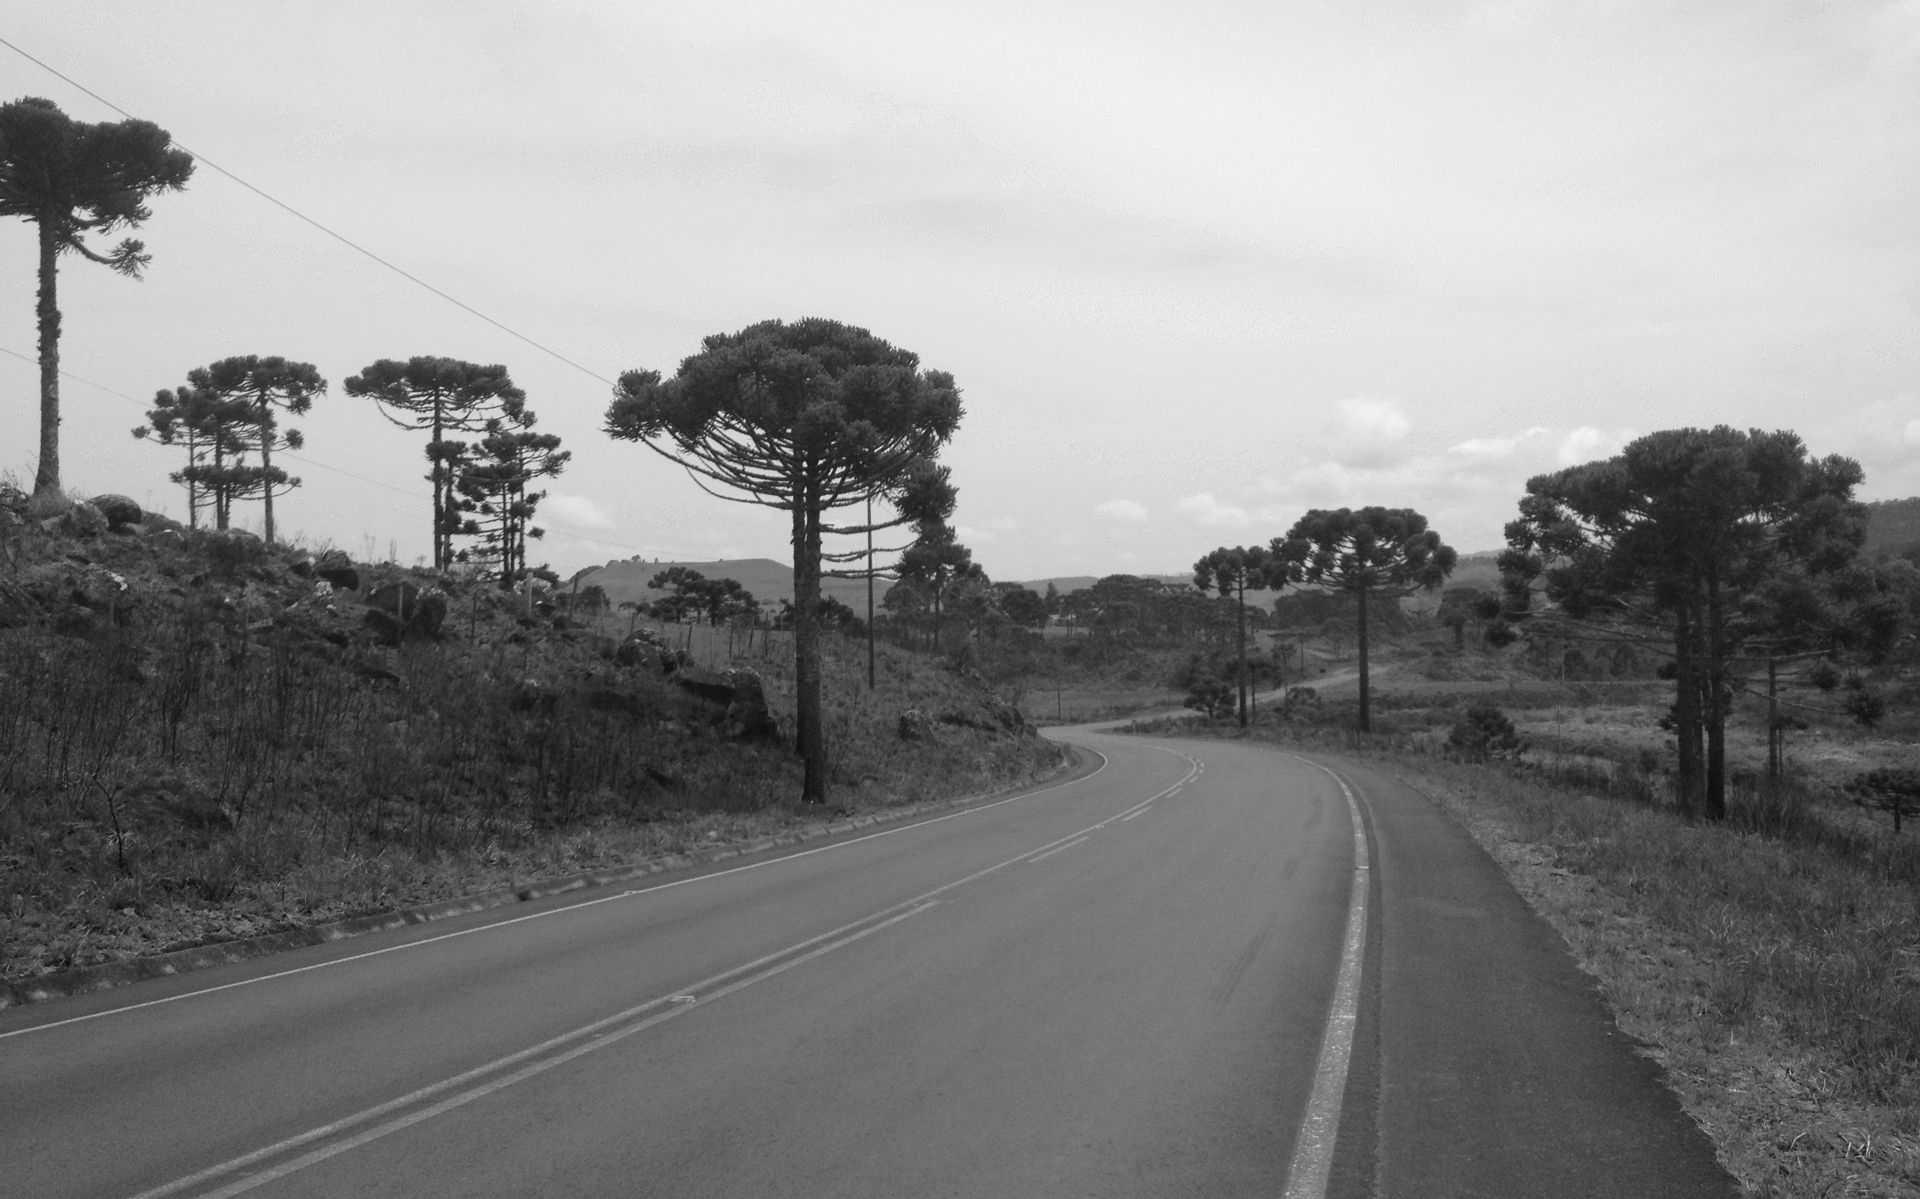 Região Serrana Catarinense